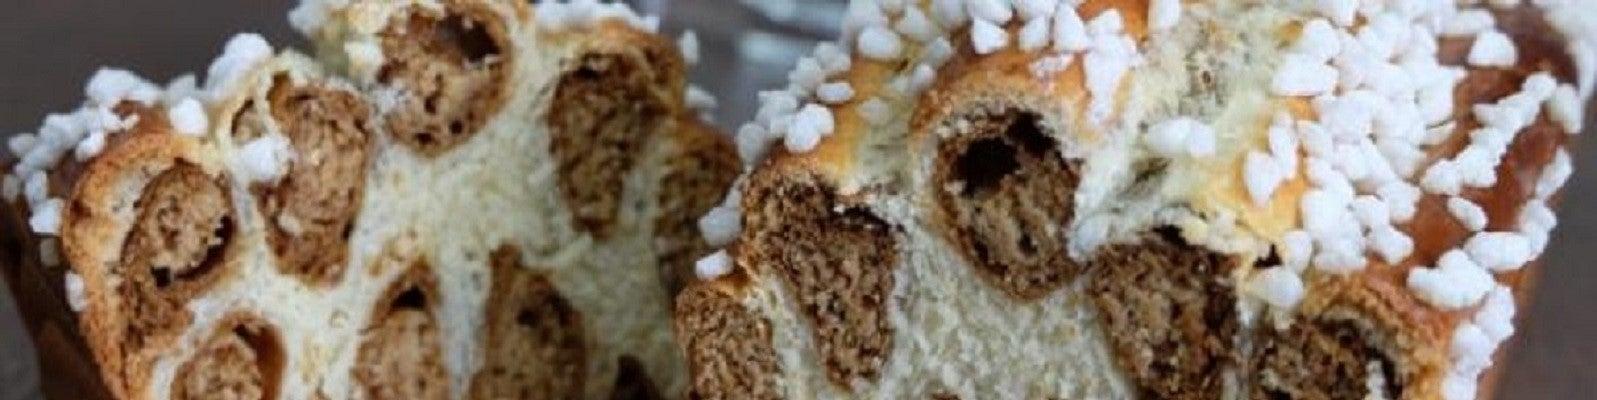 Léopard cake